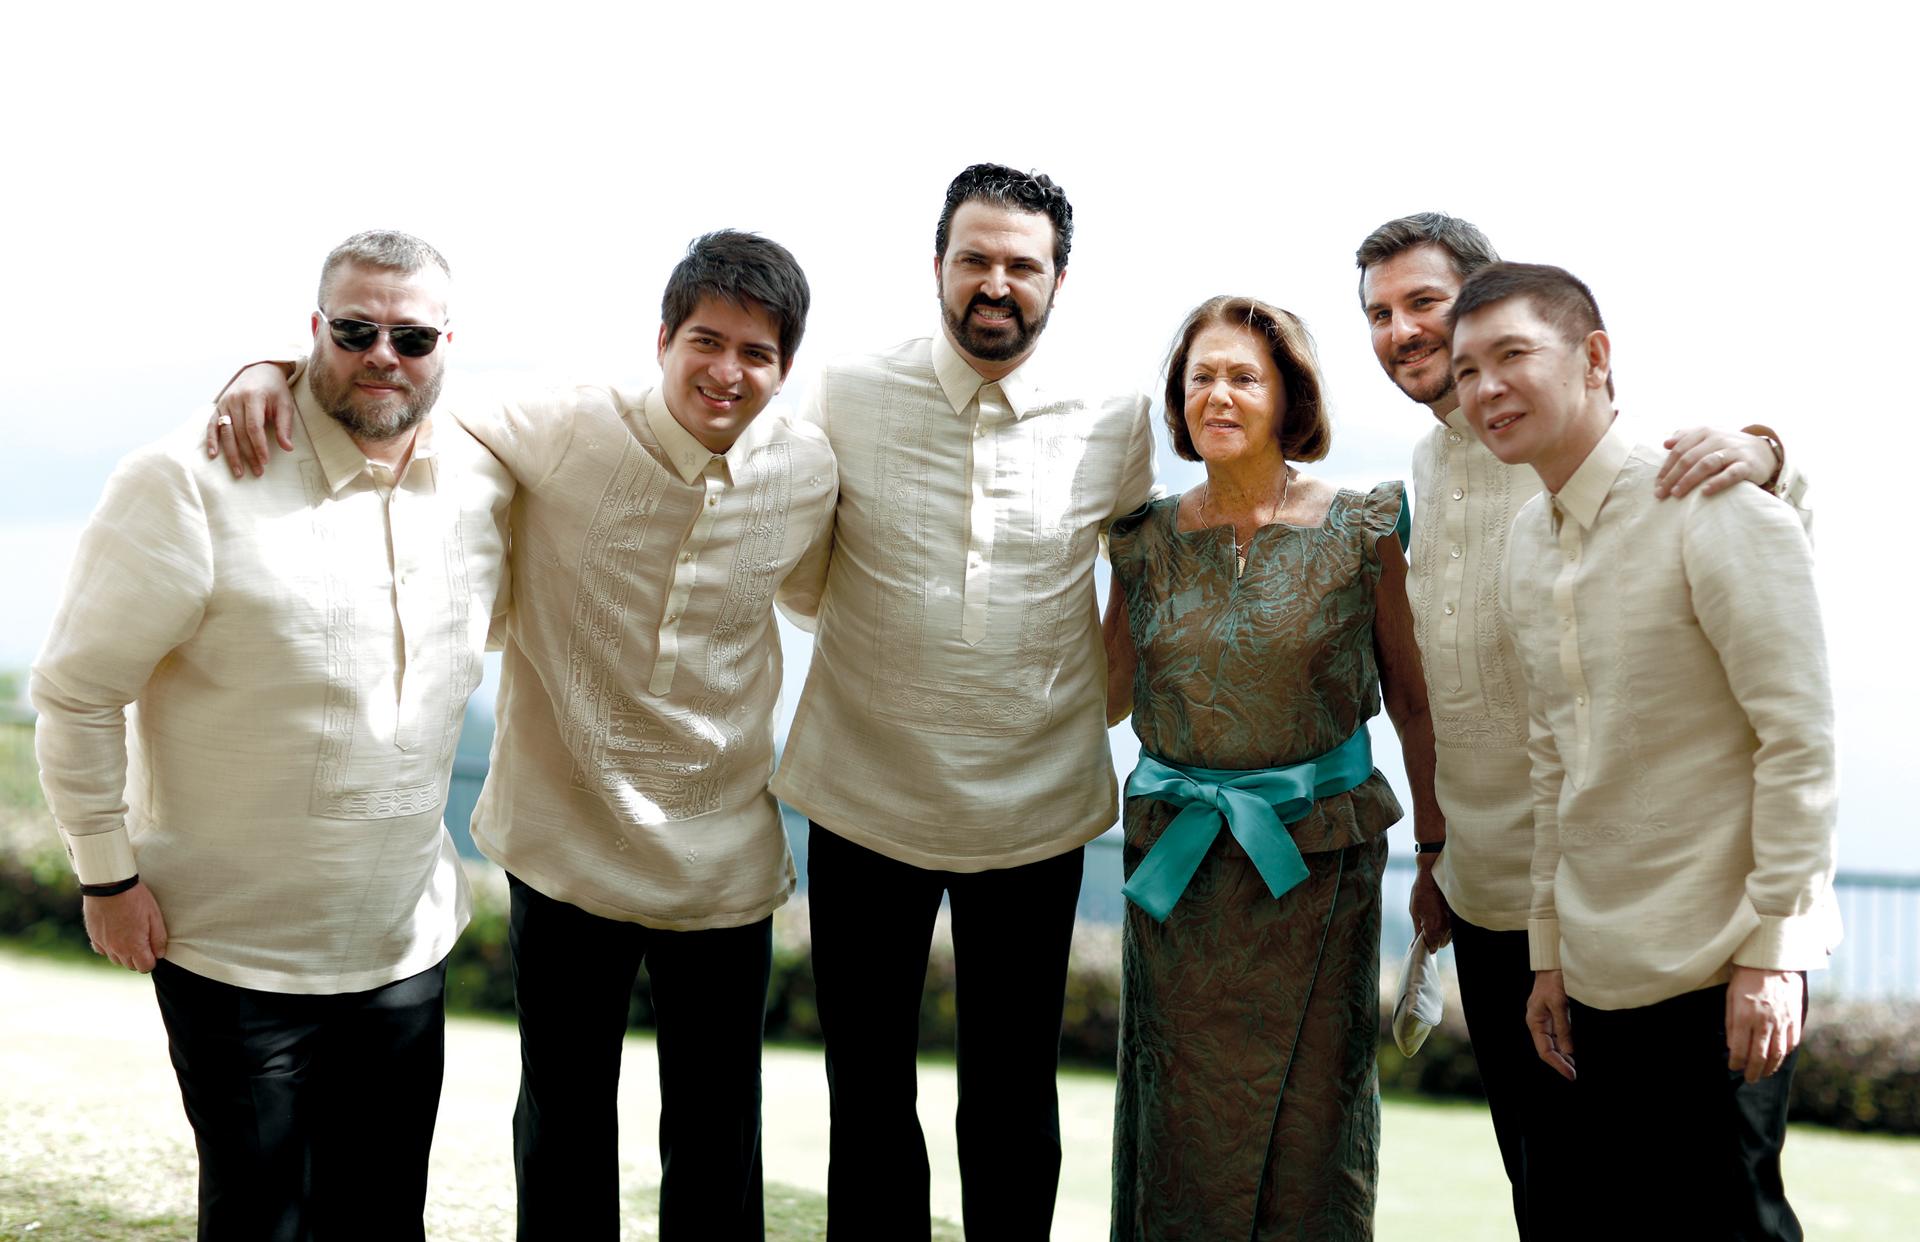 Kristoffer Larsen, Raoul Olbes, the groom and his mother Doña Teresa Benegas Lynch, Jonathan Crespi, Richard Tiu